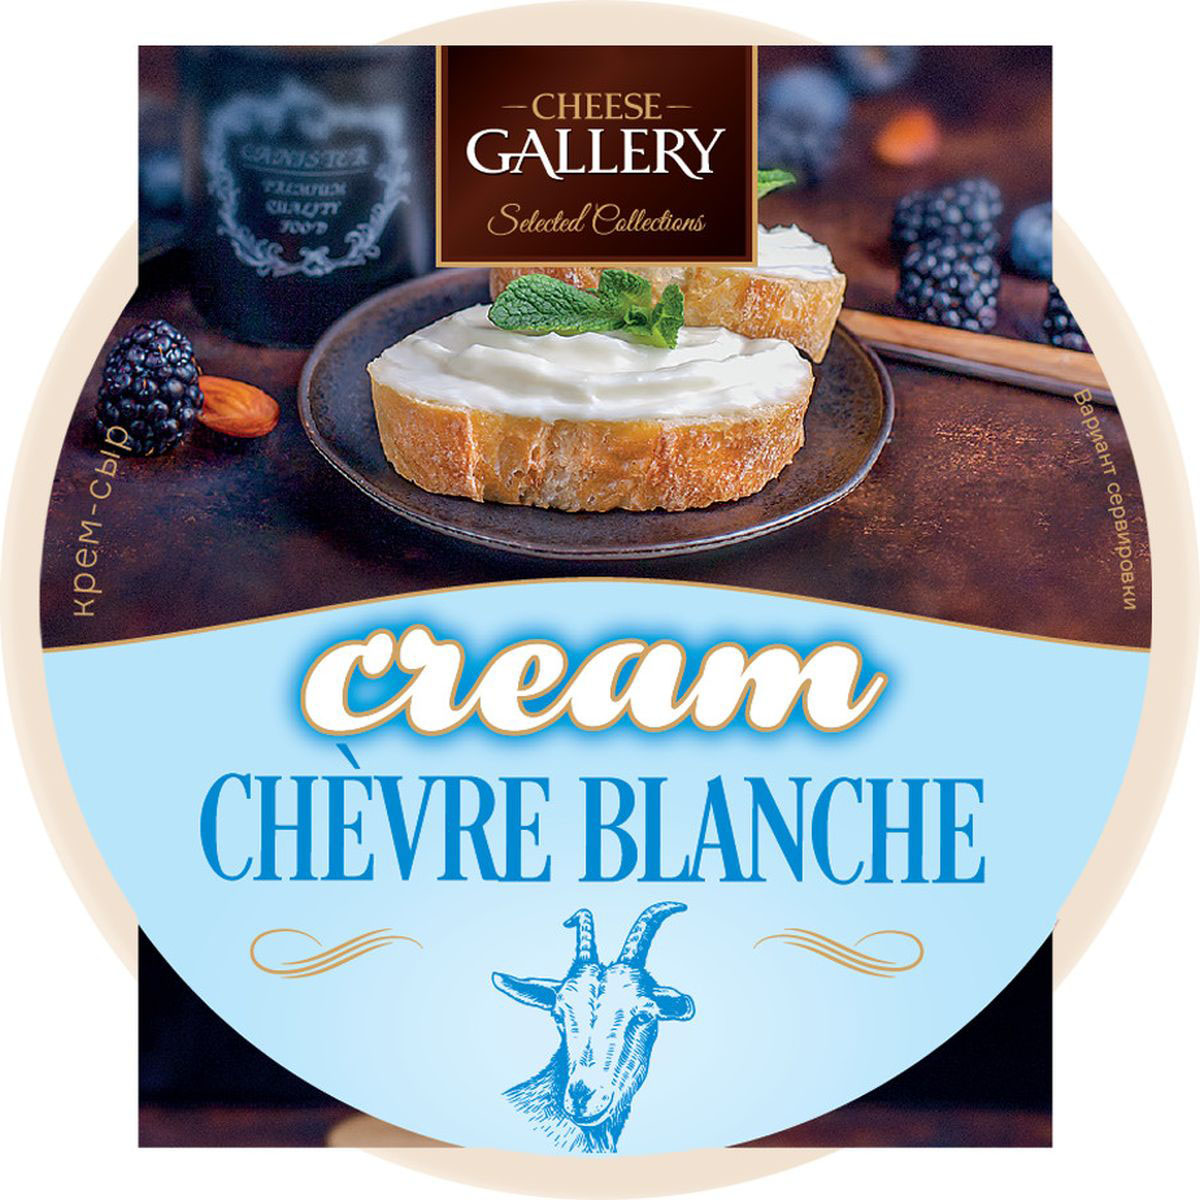 Cheese Gallery Chevre Blanche Крем-сыр, 150 г cheese gallery